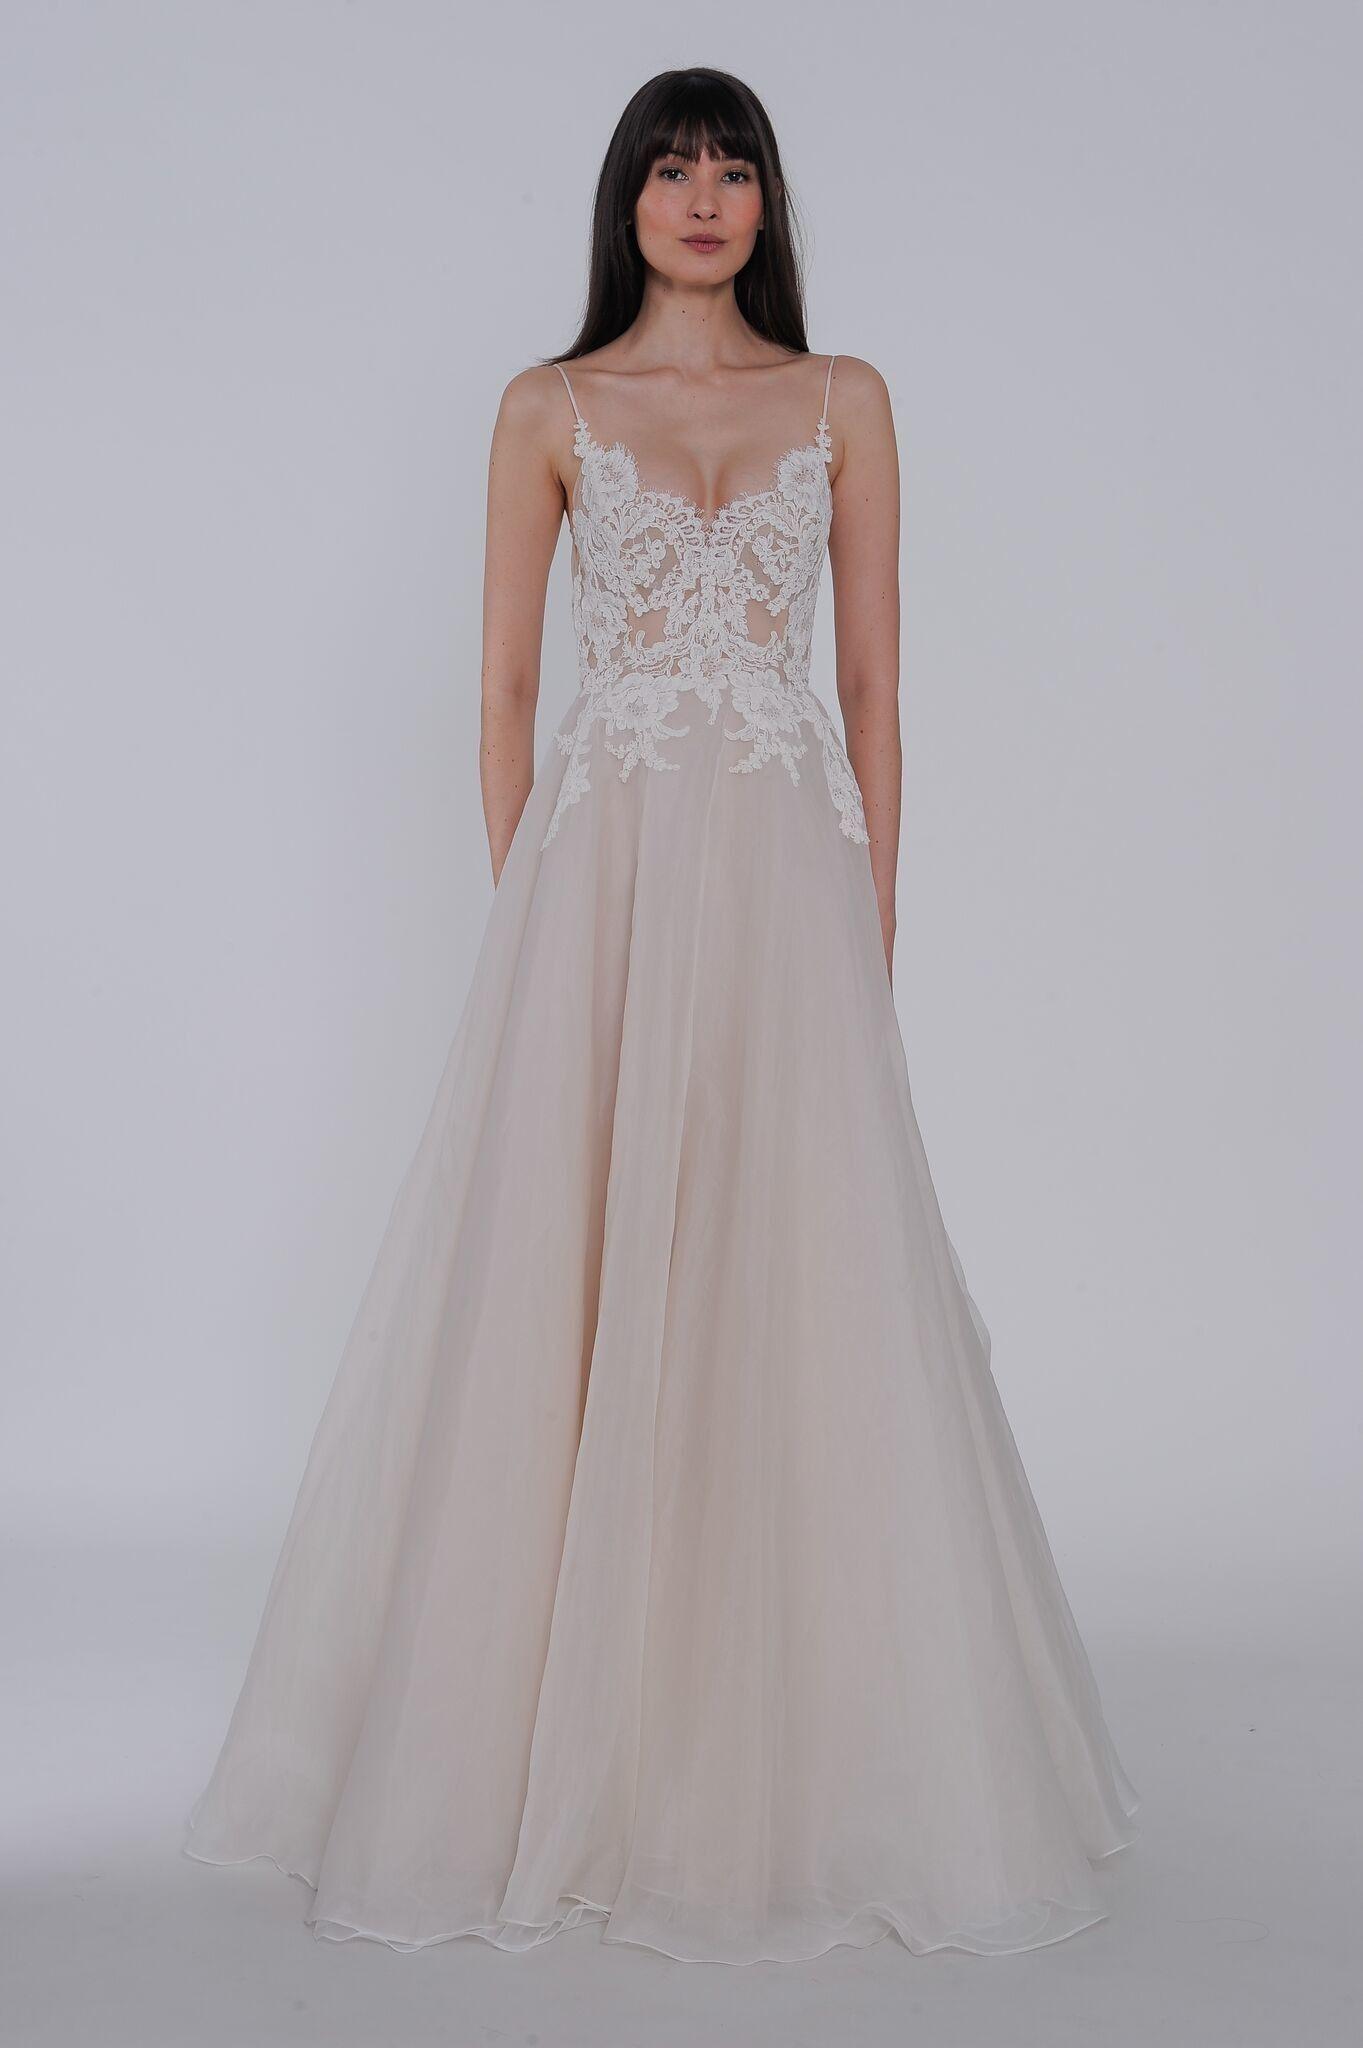 Lace spaghetti strap wedding dress  Lazaro Spring  Wedding Dress Collection  Bridals By Lori